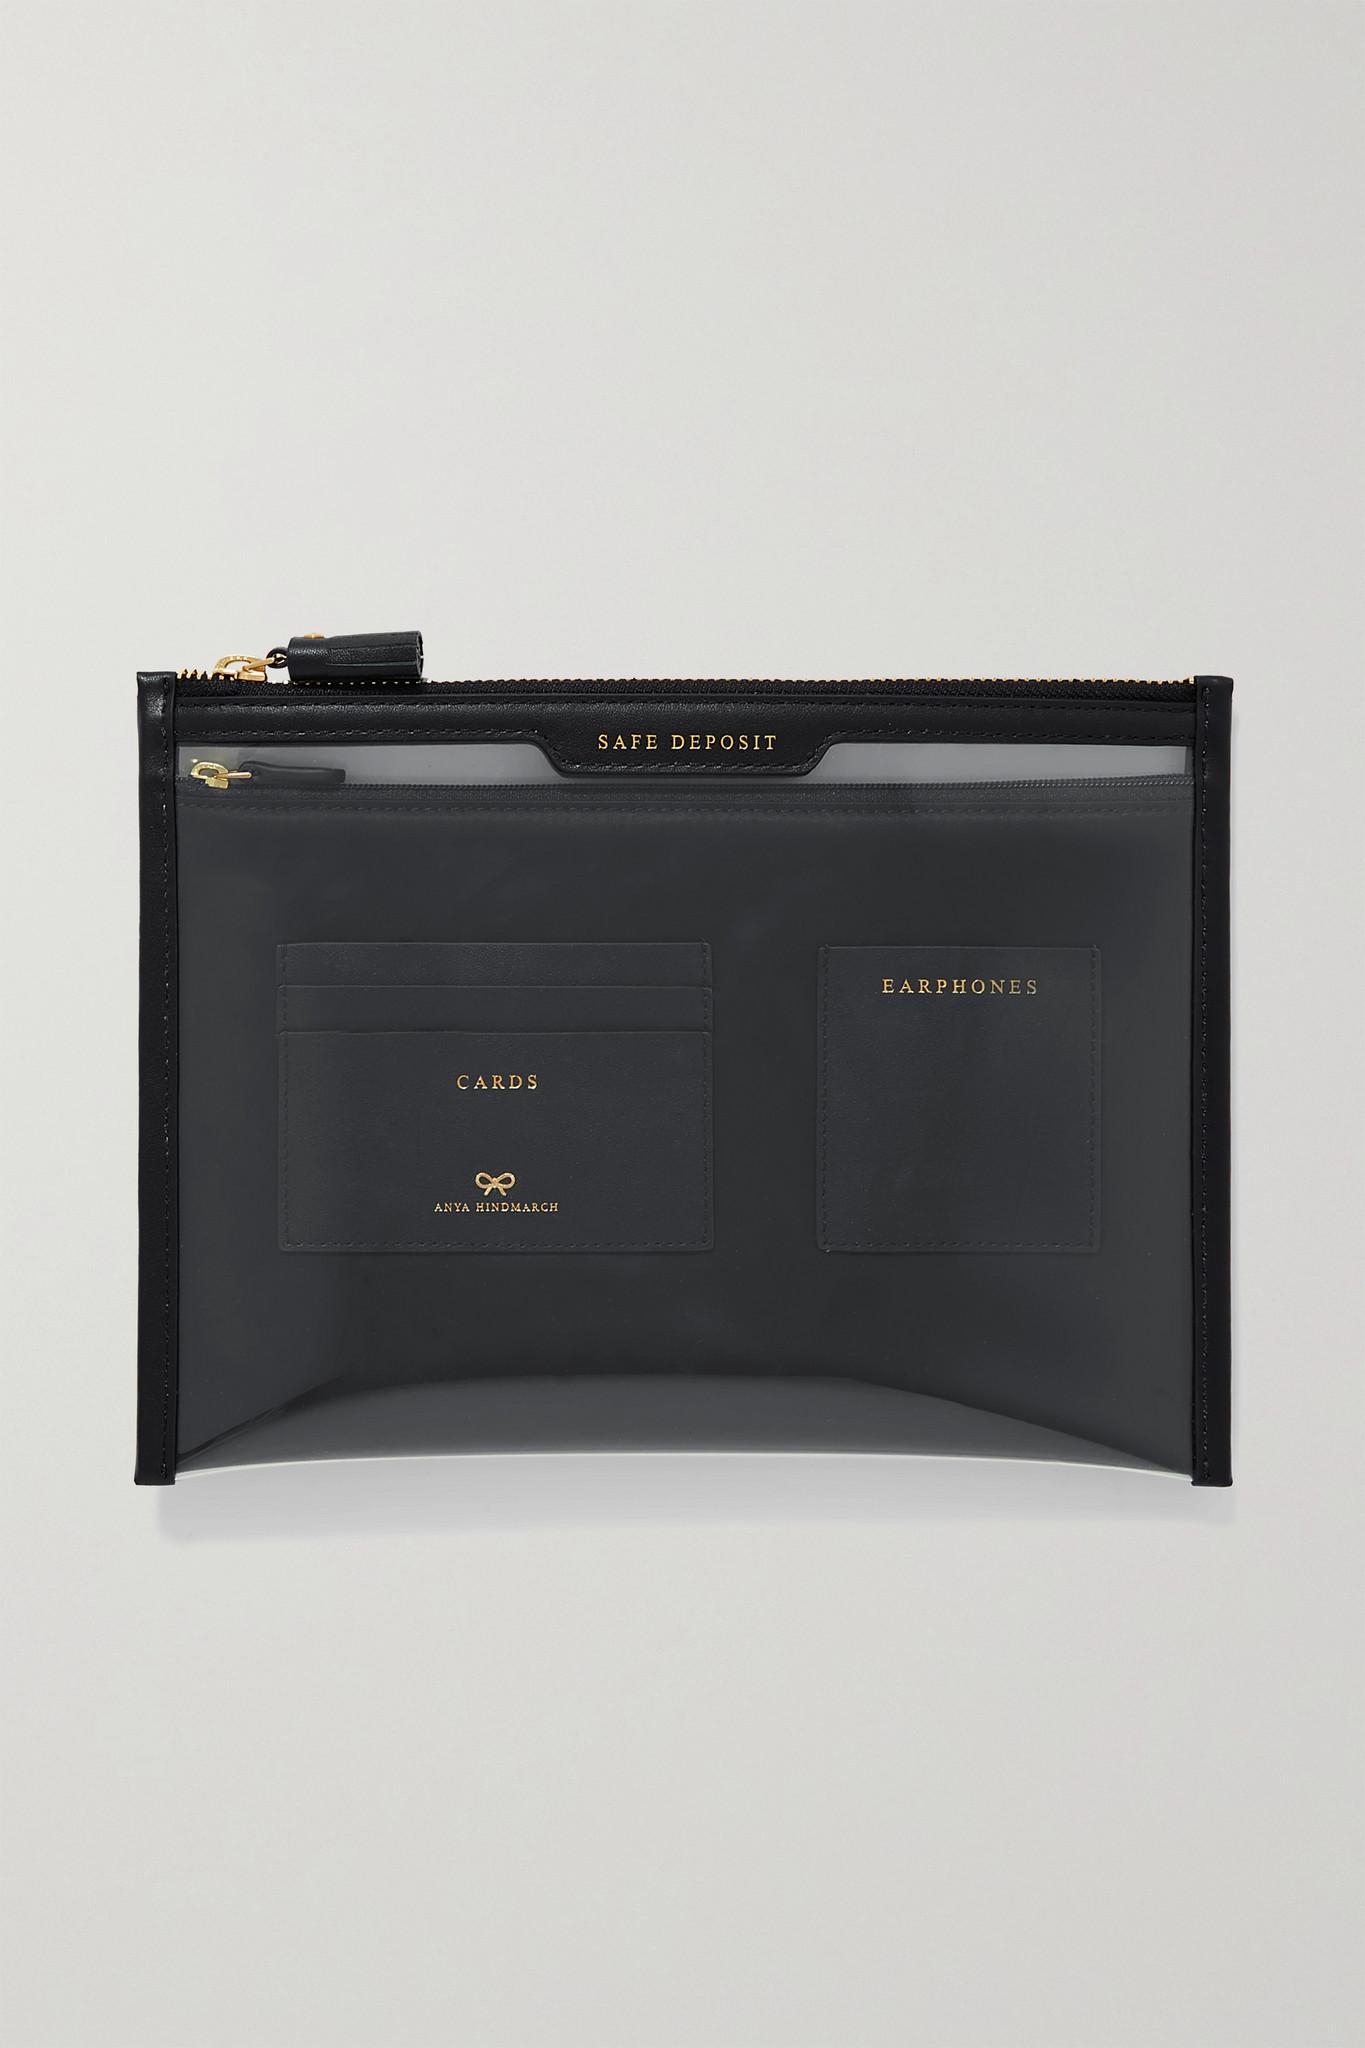 ANYA HINDMARCH - Safe Deposit 皮革边饰 Pvc 小袋 - 黑色 - one size